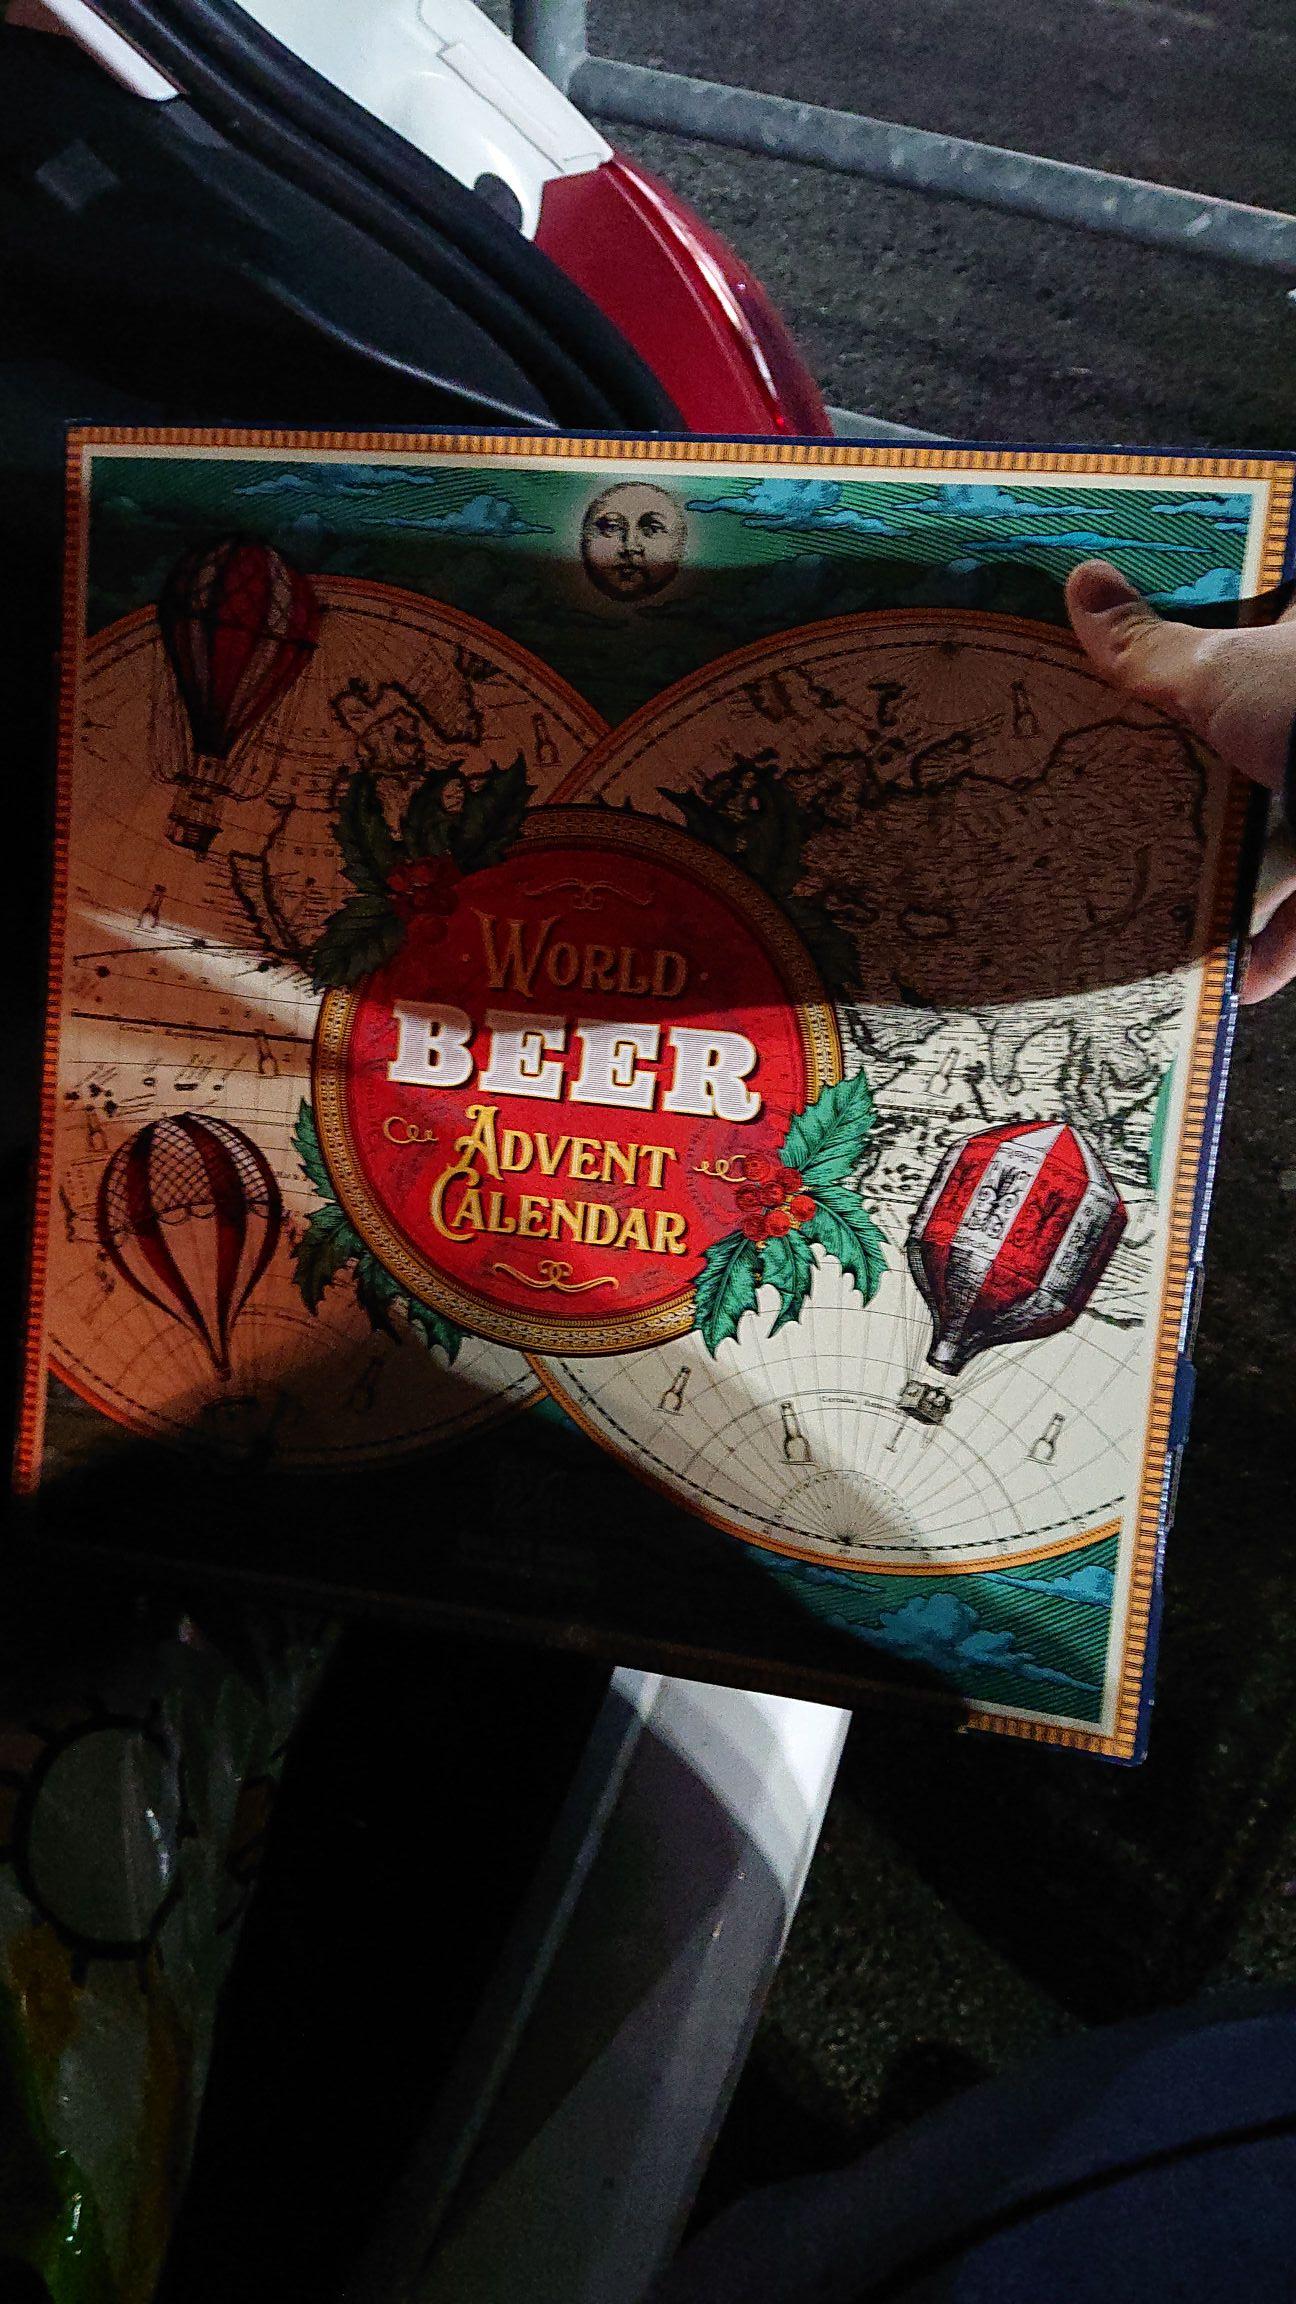 World beer advent calendar £23.49 @ Costco